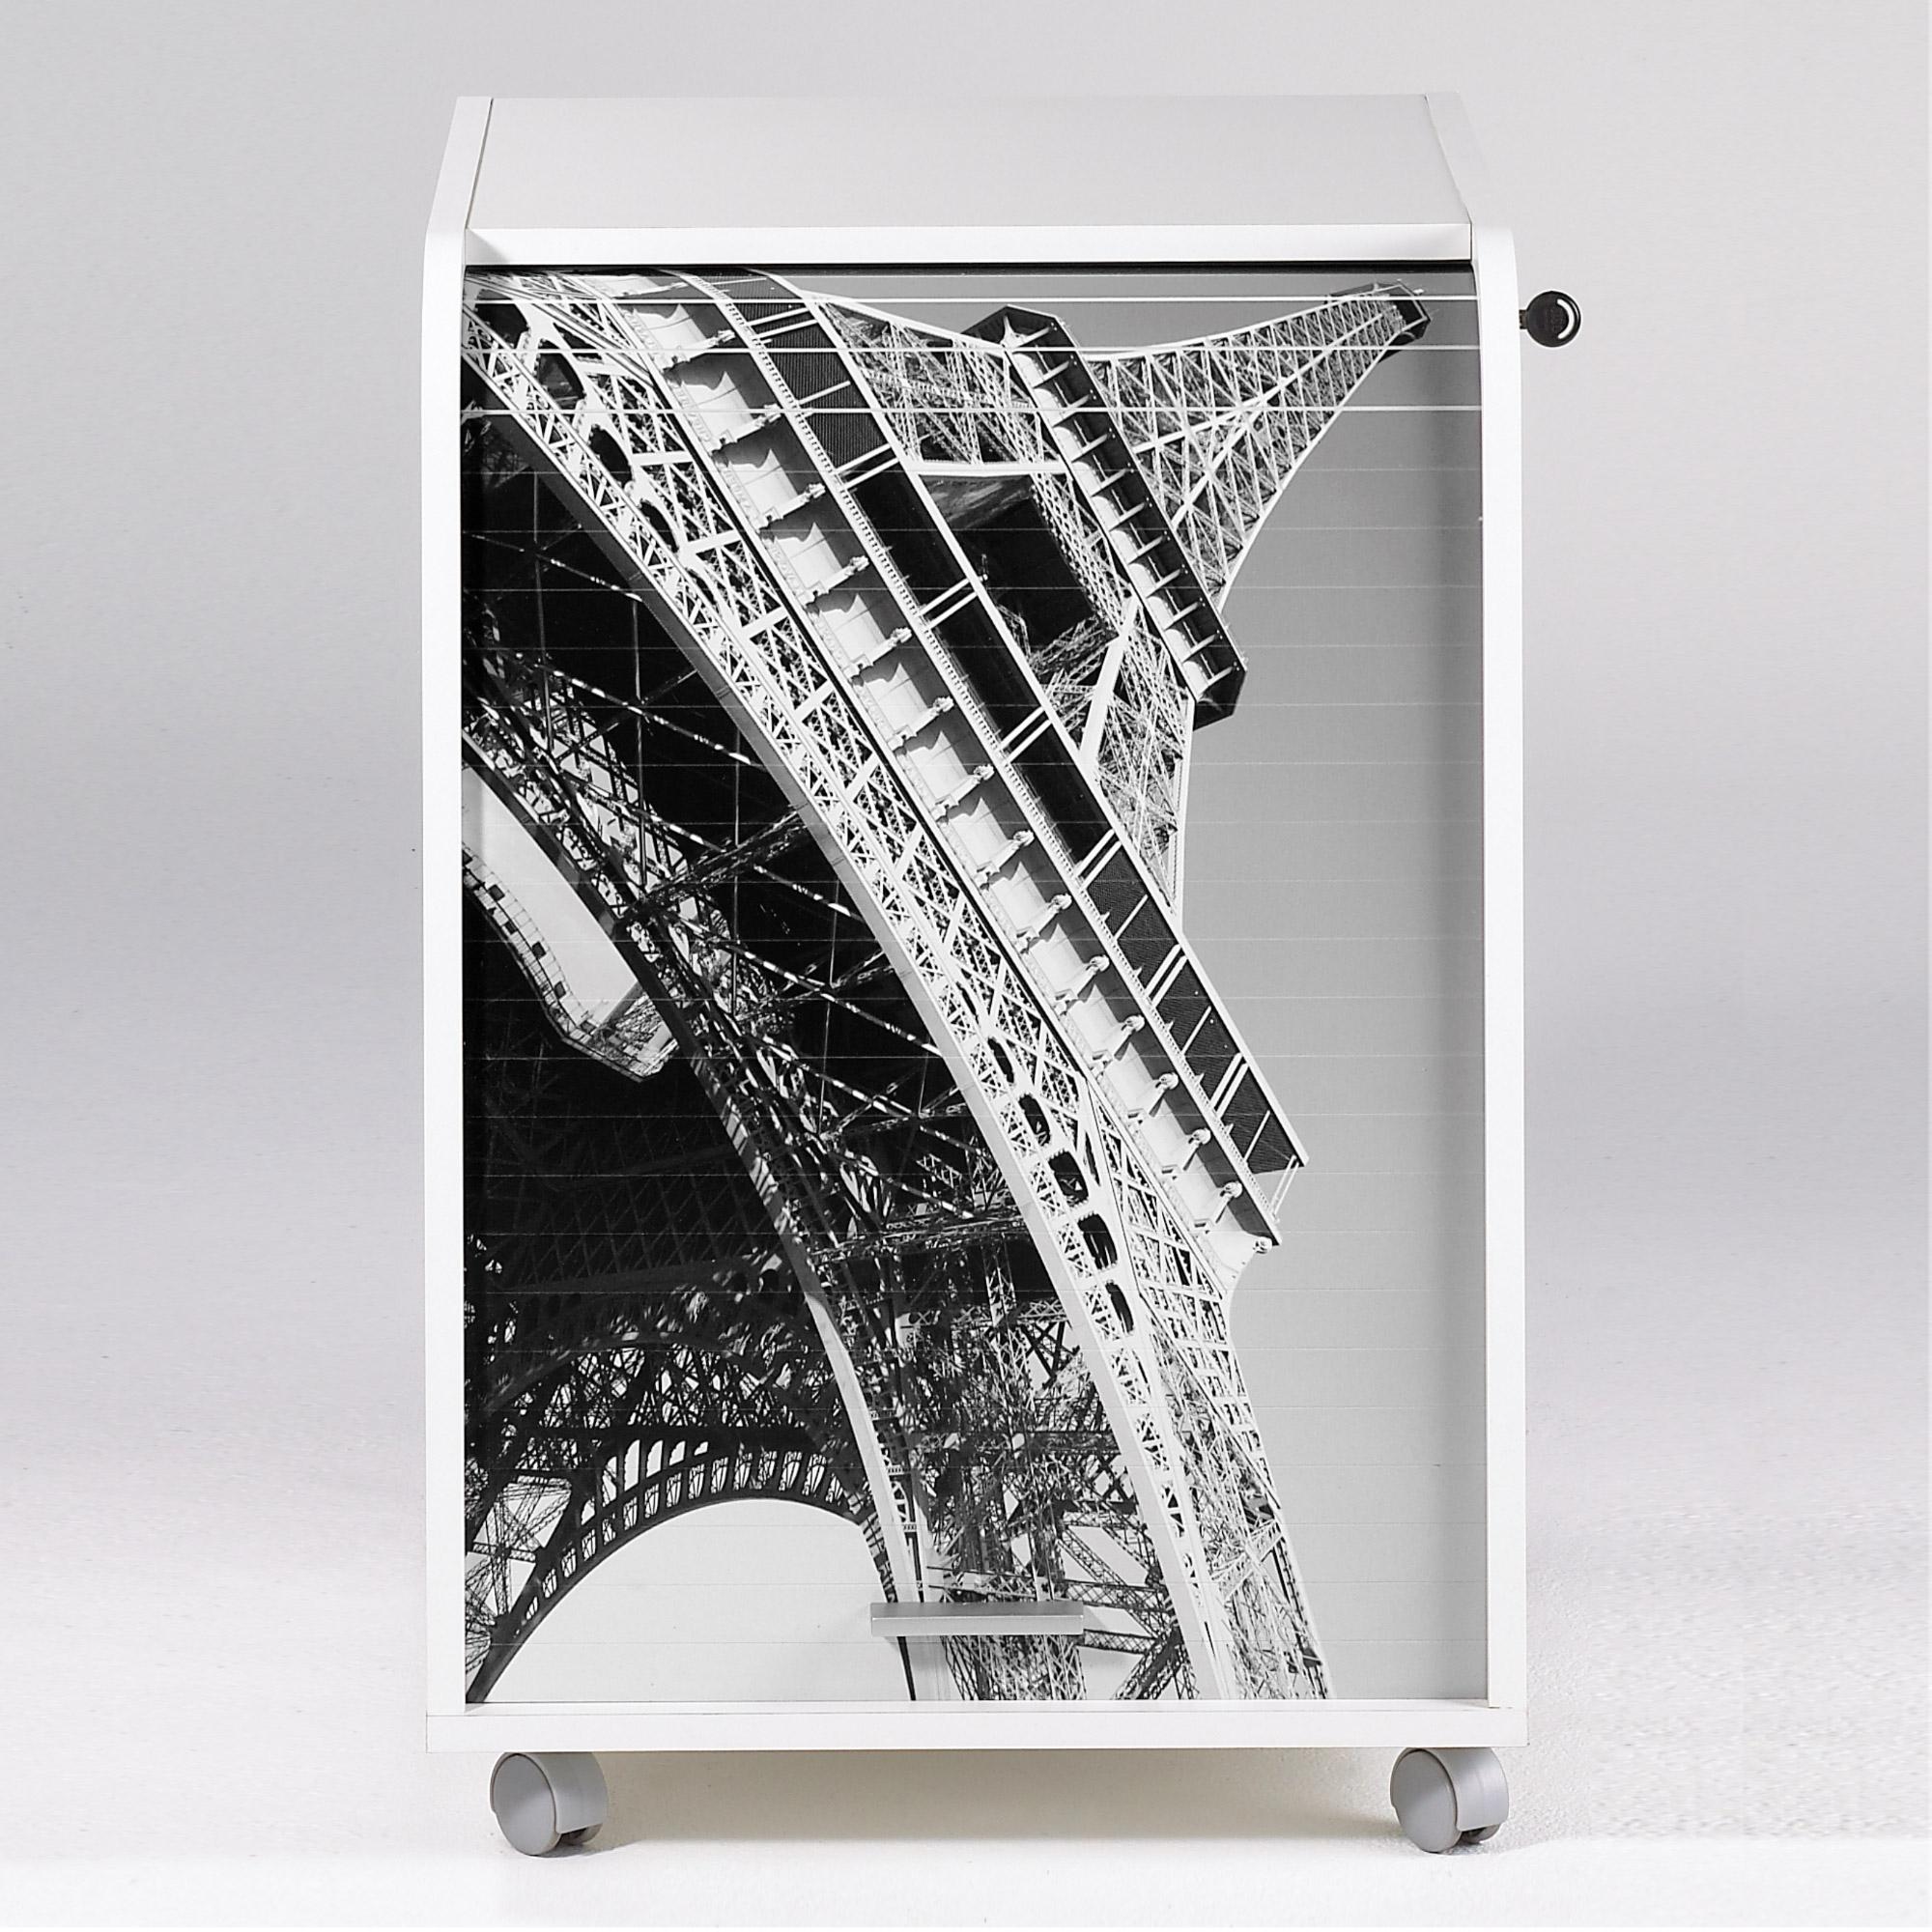 caisson de bureau orga blanc 70 cm paris. Black Bedroom Furniture Sets. Home Design Ideas